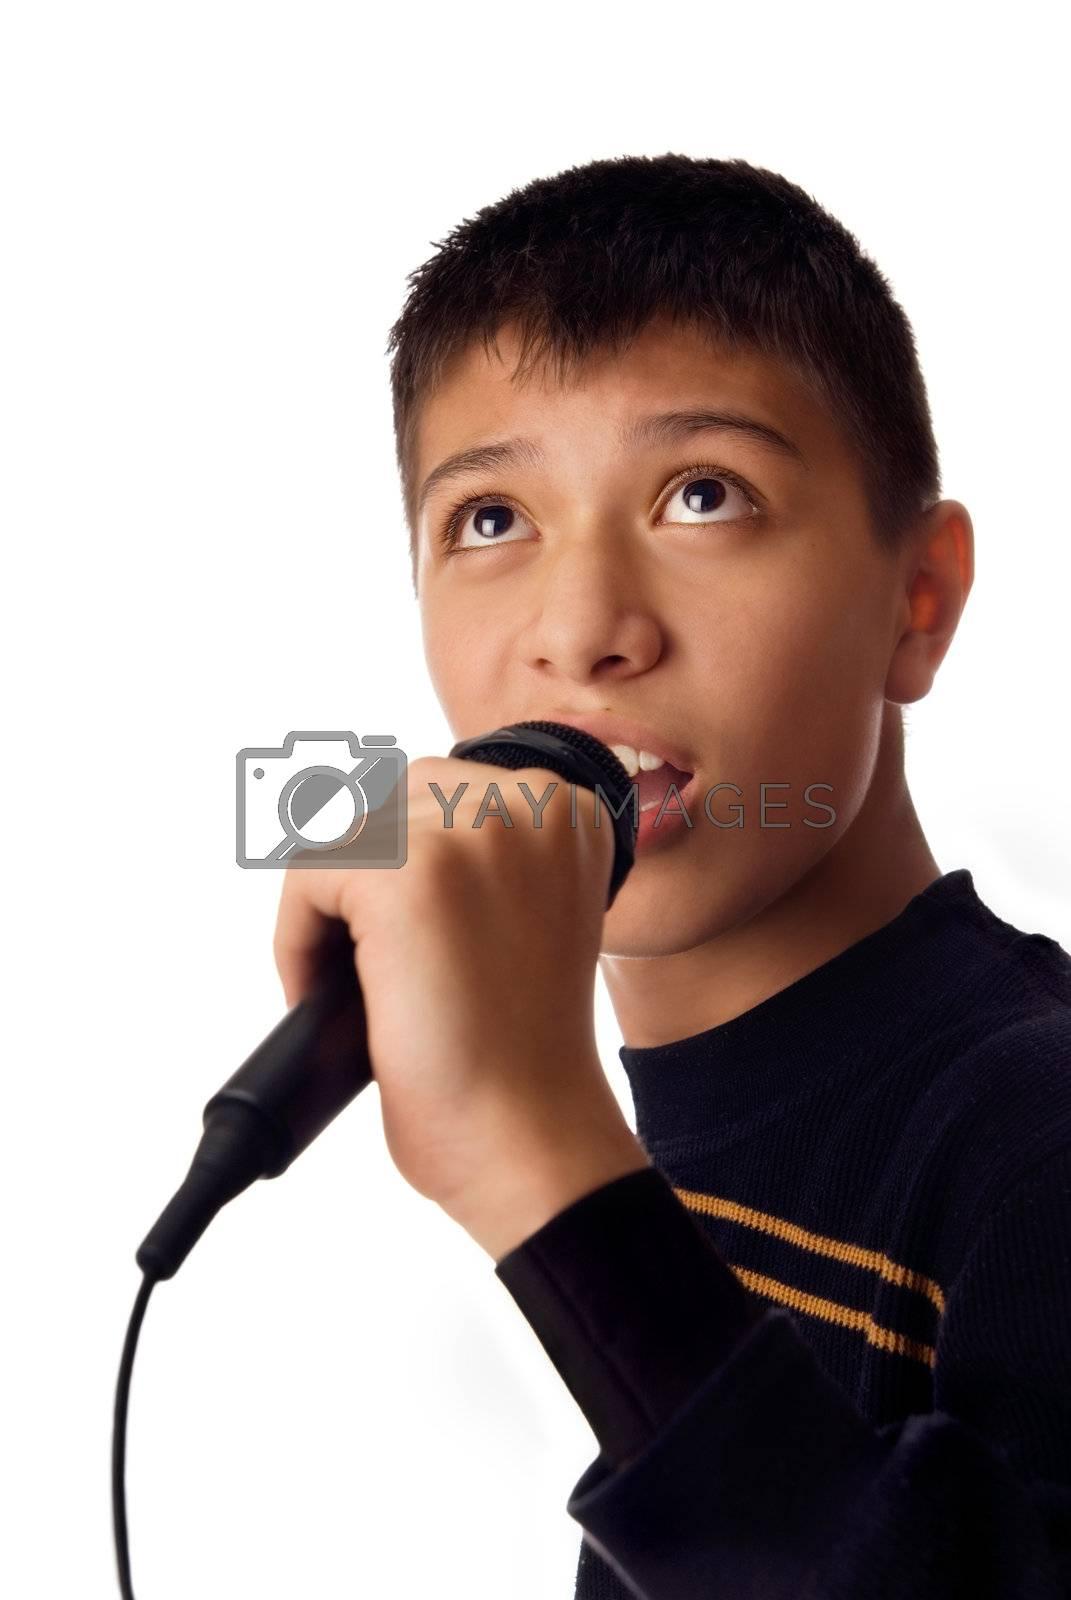 Photo of young boy singing a karaoke song